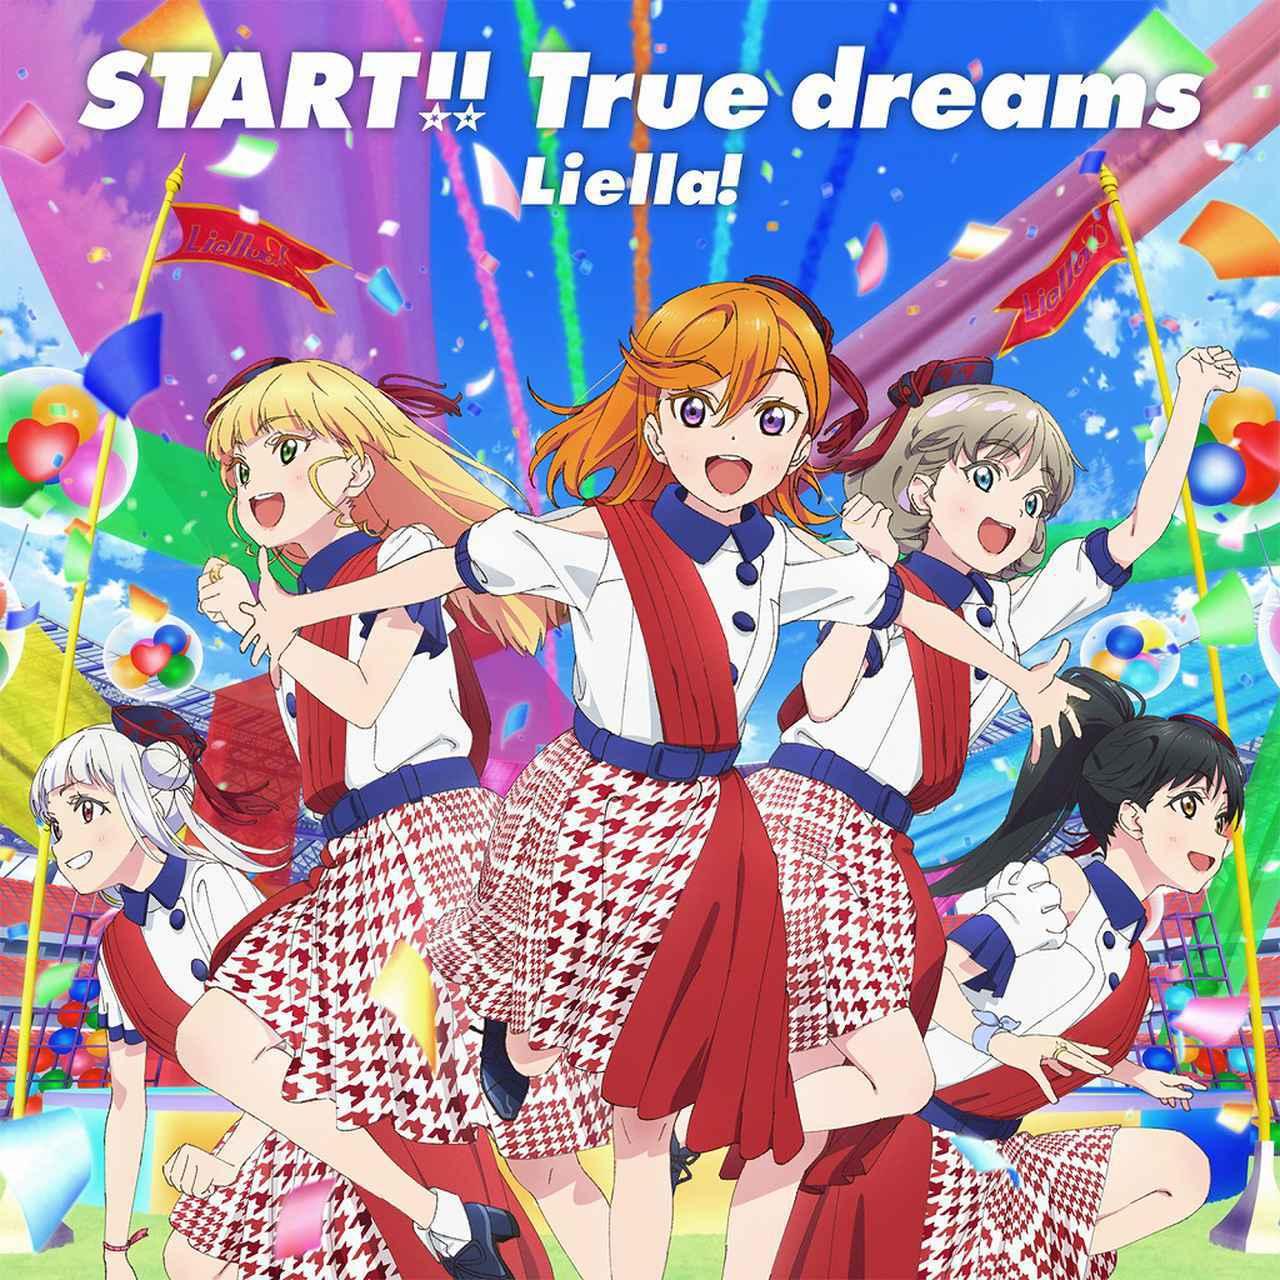 画像: START!! True dreams / Liella!